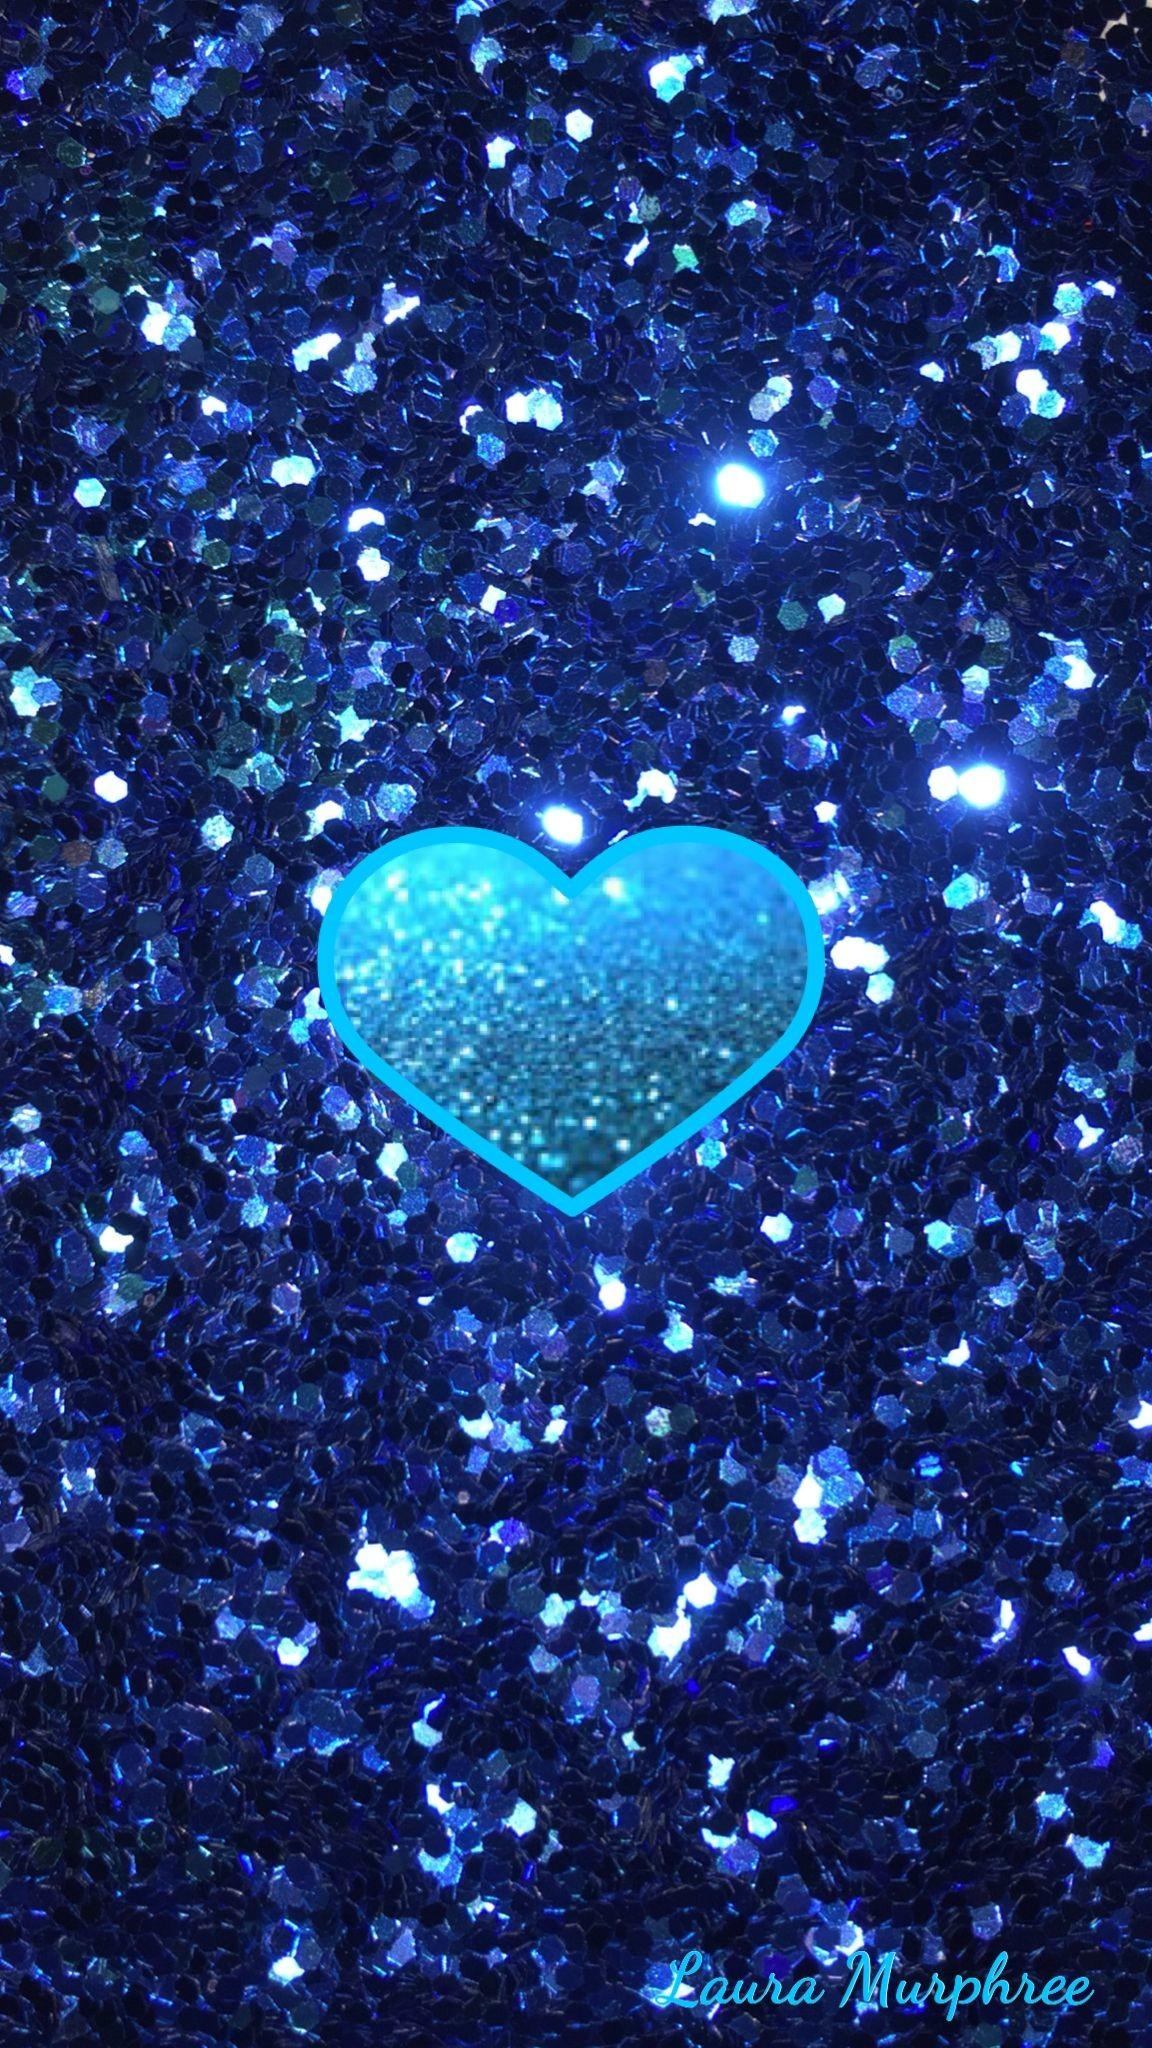 Res: 1152x2048, Glitter phone wallpaper Glitter phone wallpaper sparkle background sparkling  glittery shimmer girly pretty blue heart